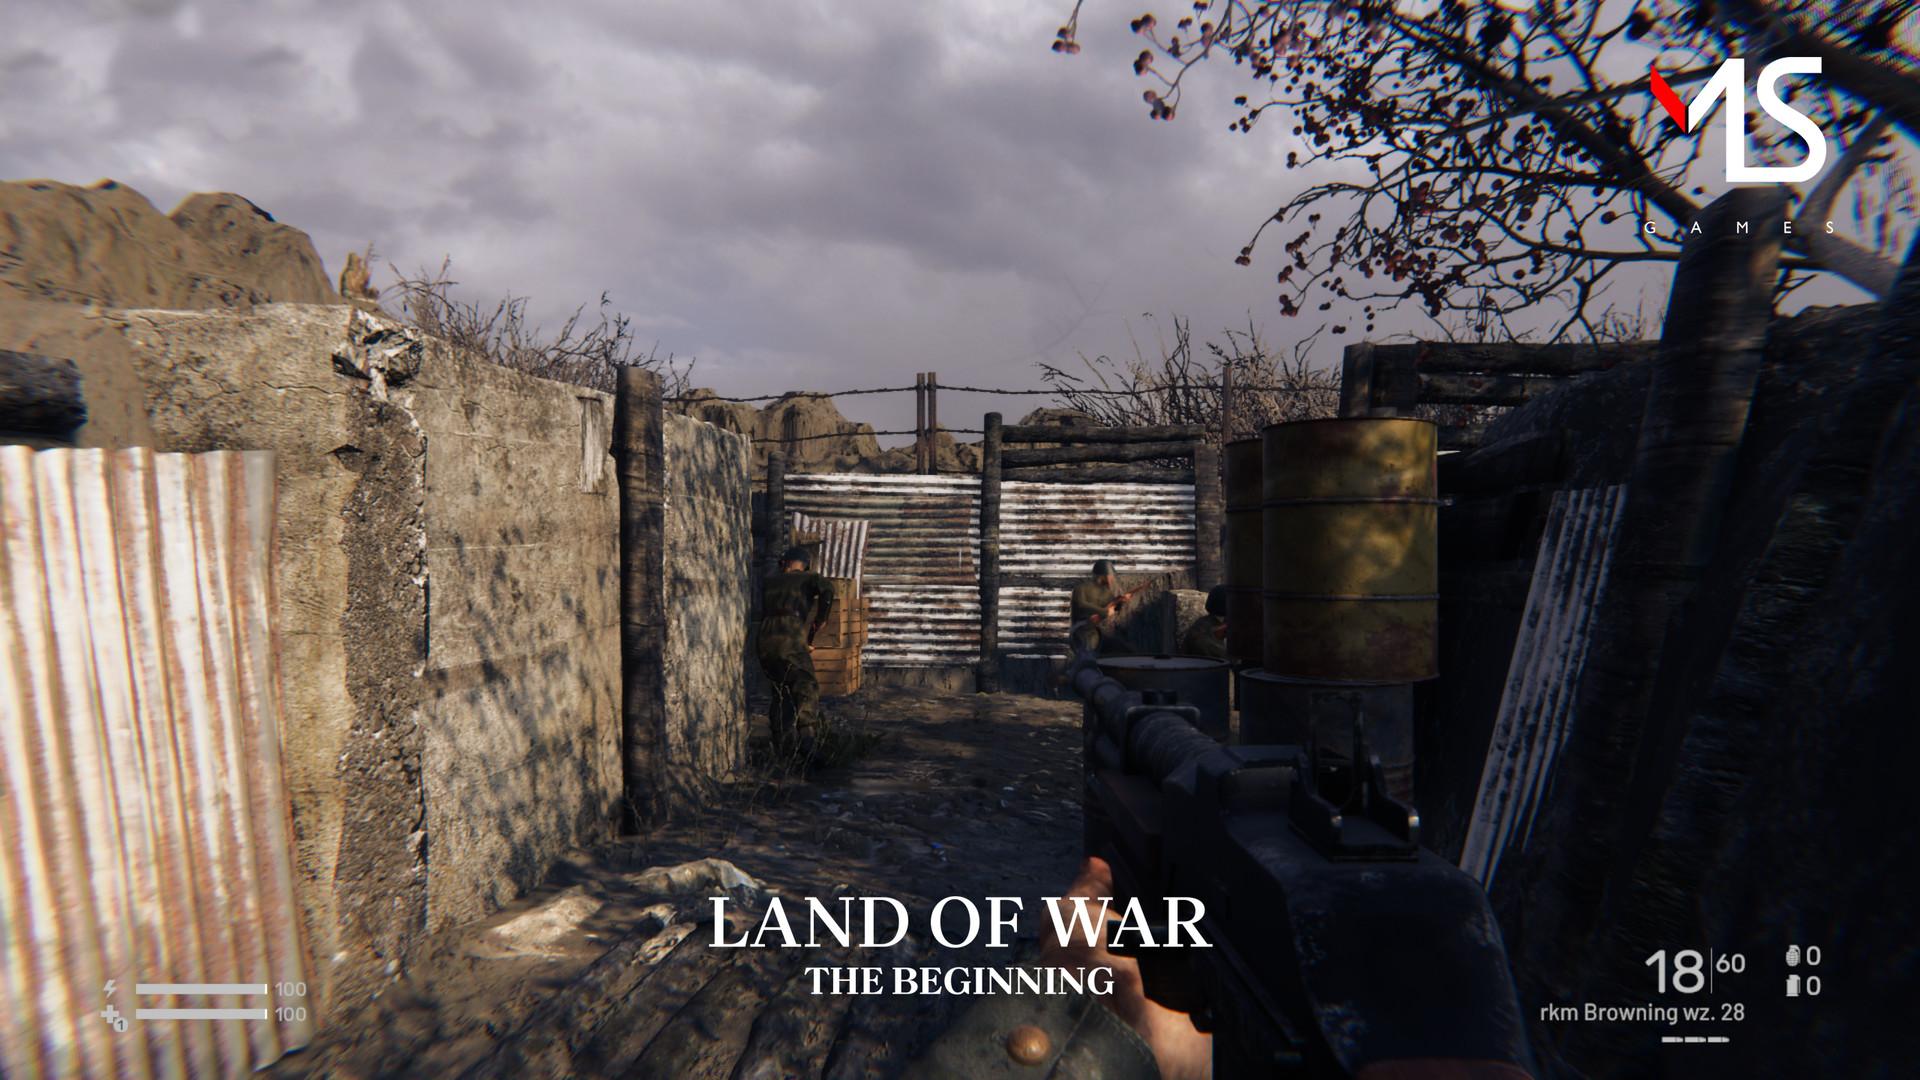 Image 17 - Land of War - The Beginning - Mod DB